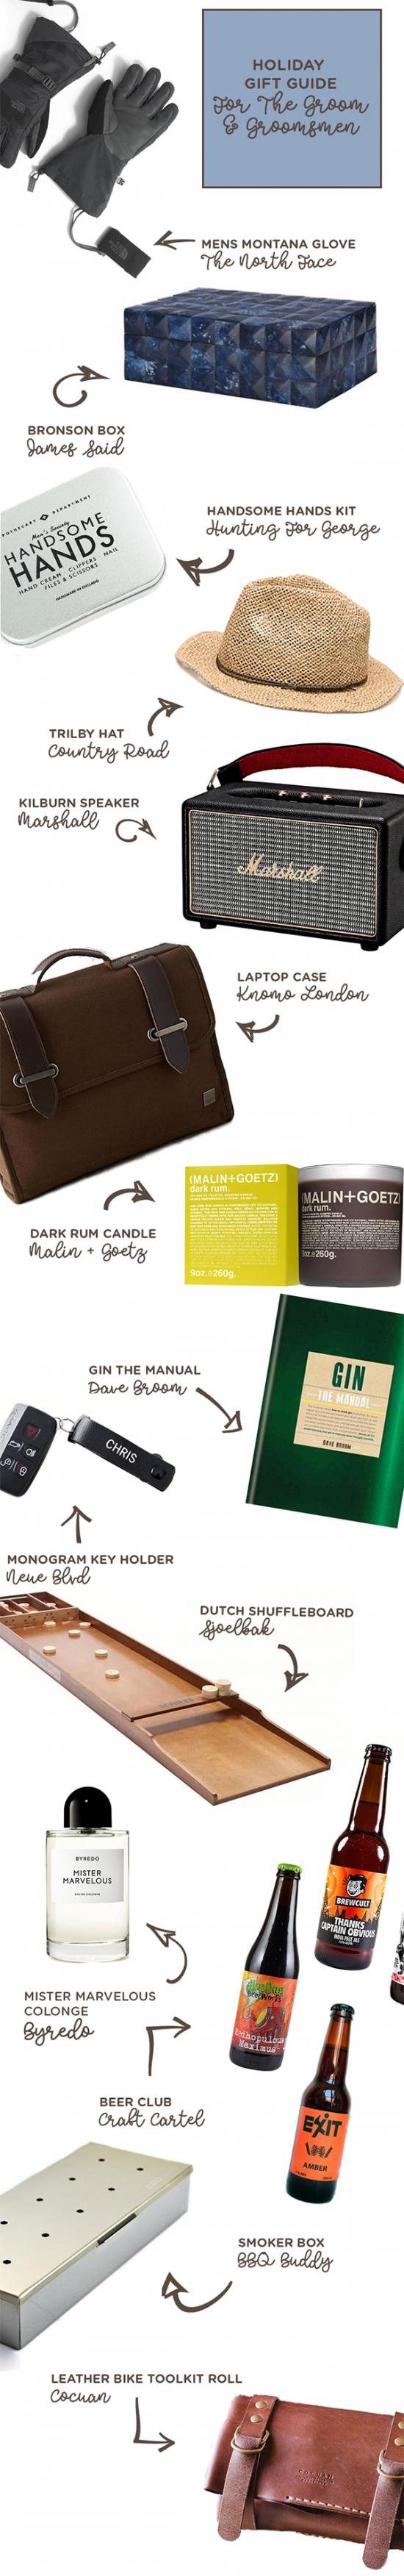 gift-ideas-for-groom-and-groomsmen